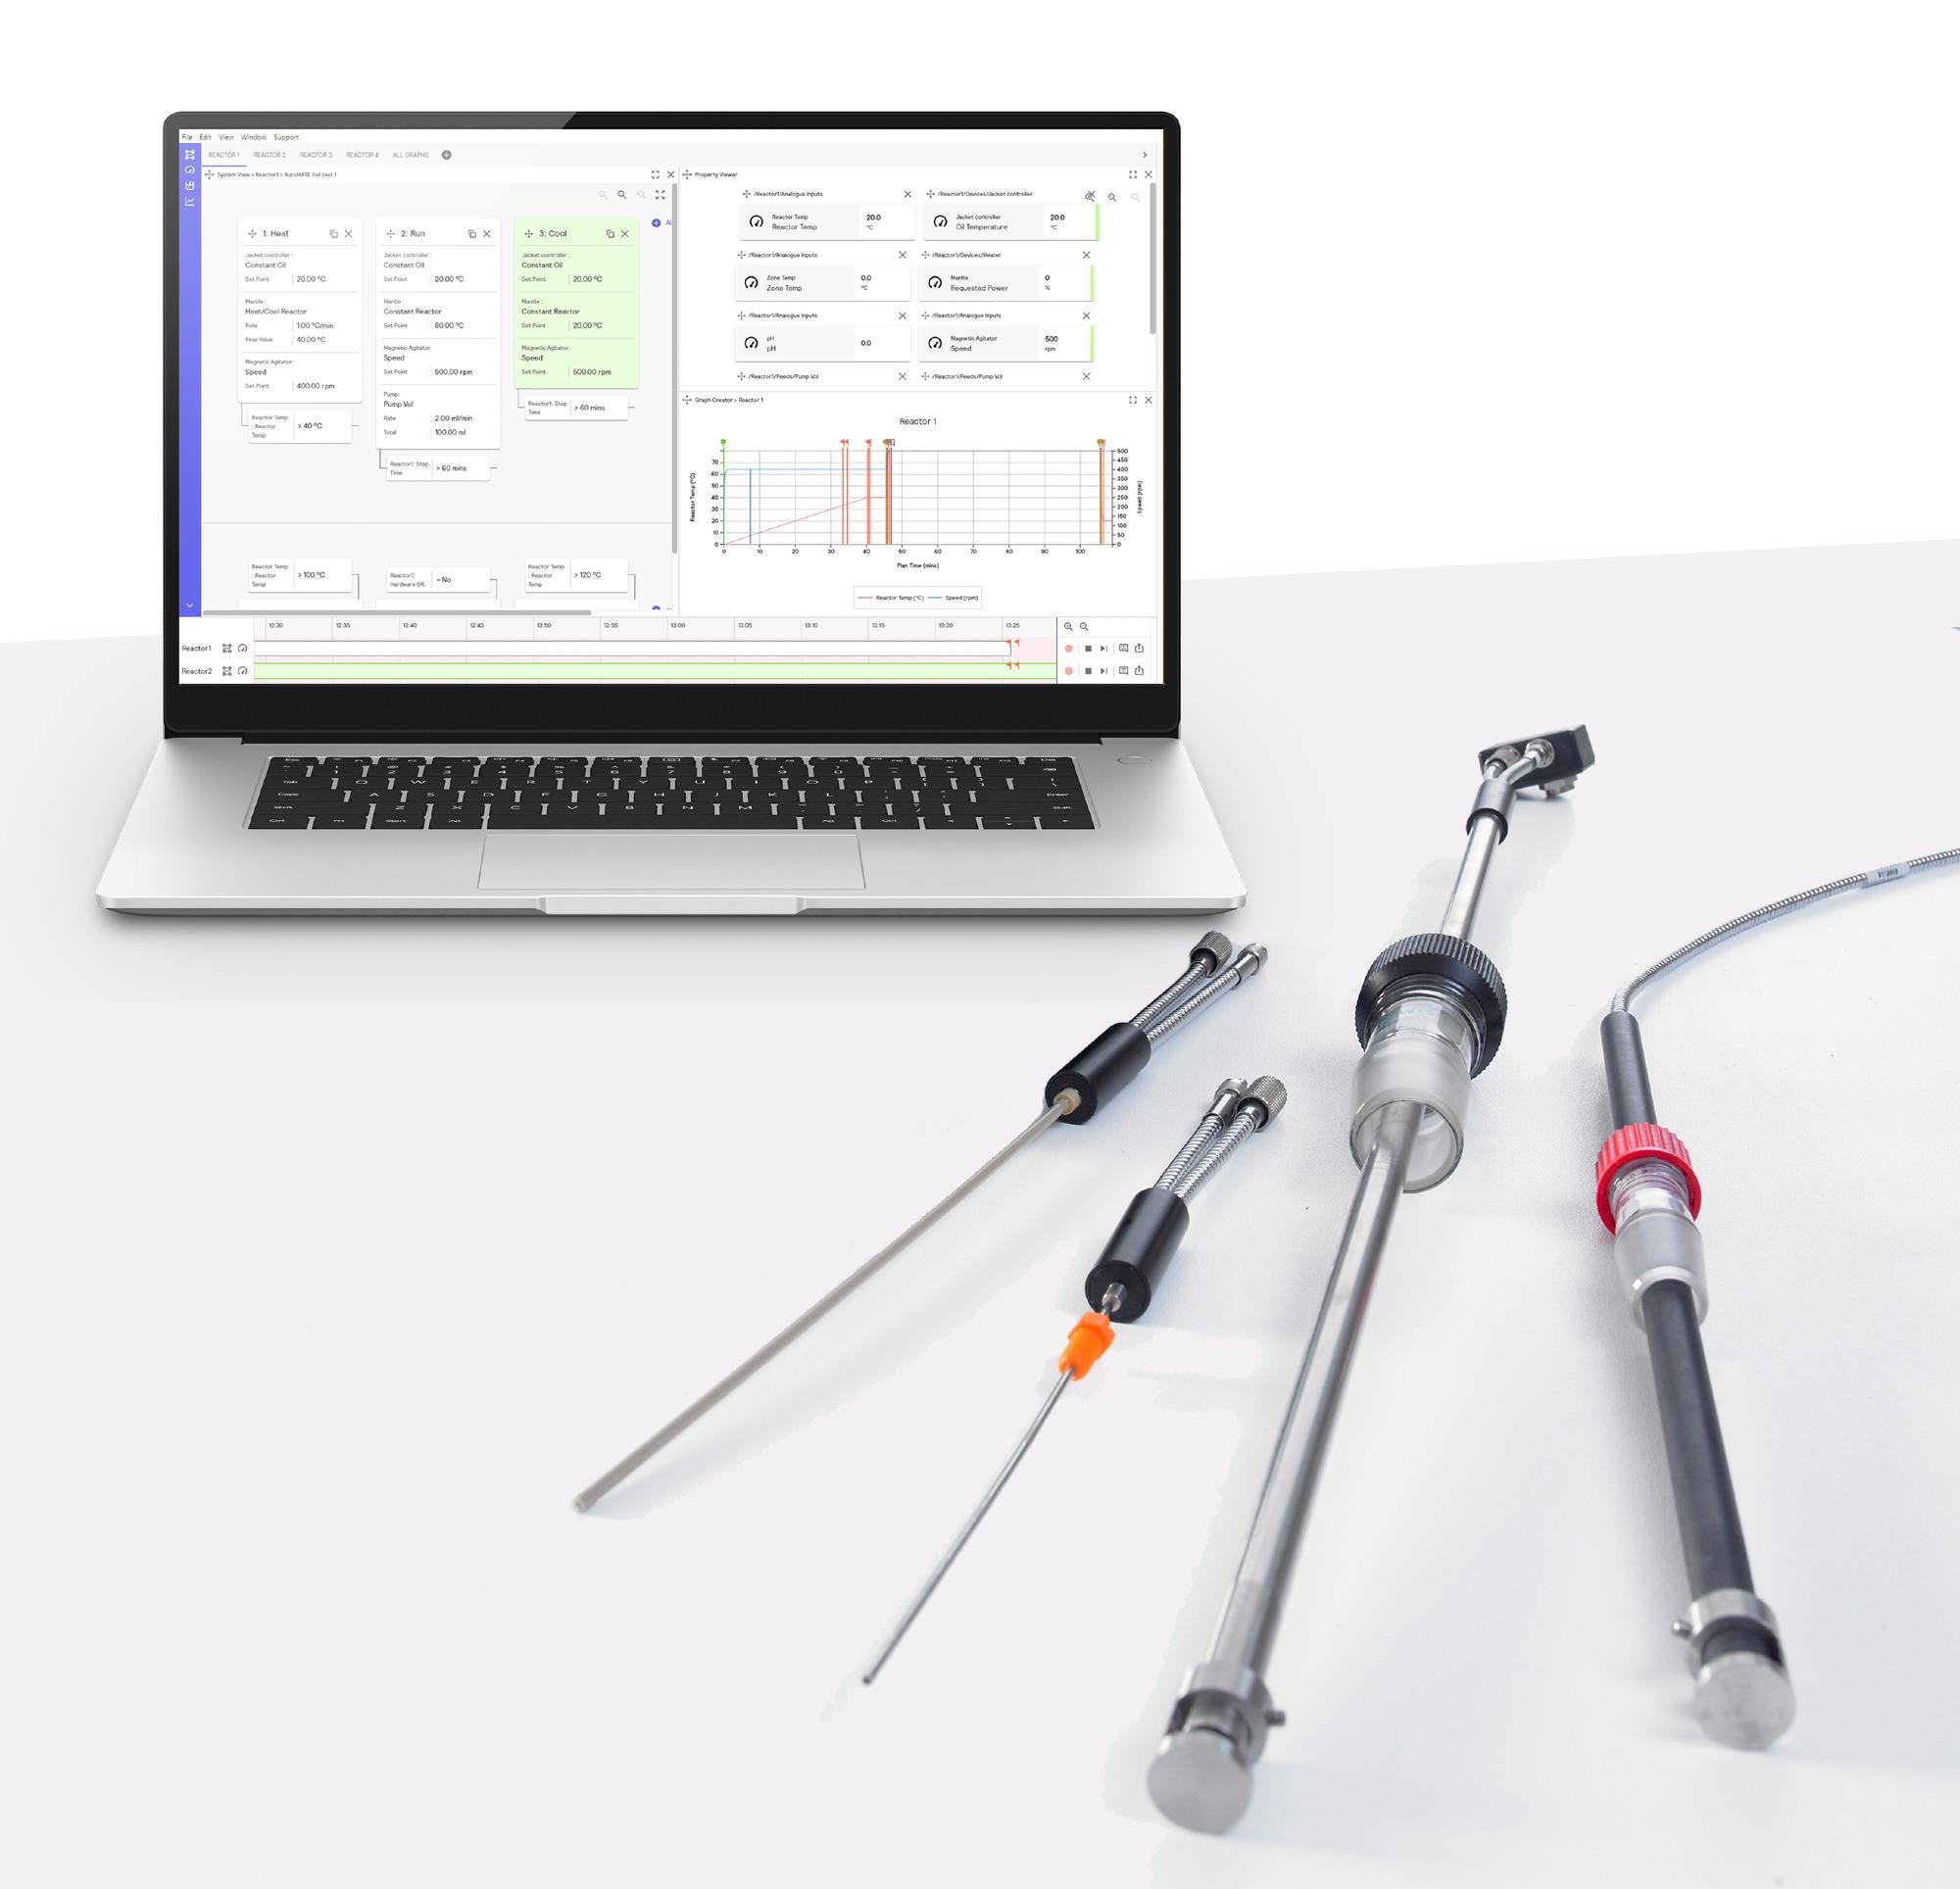 CrystalEYES: A Crystallization Monitoring Sensor